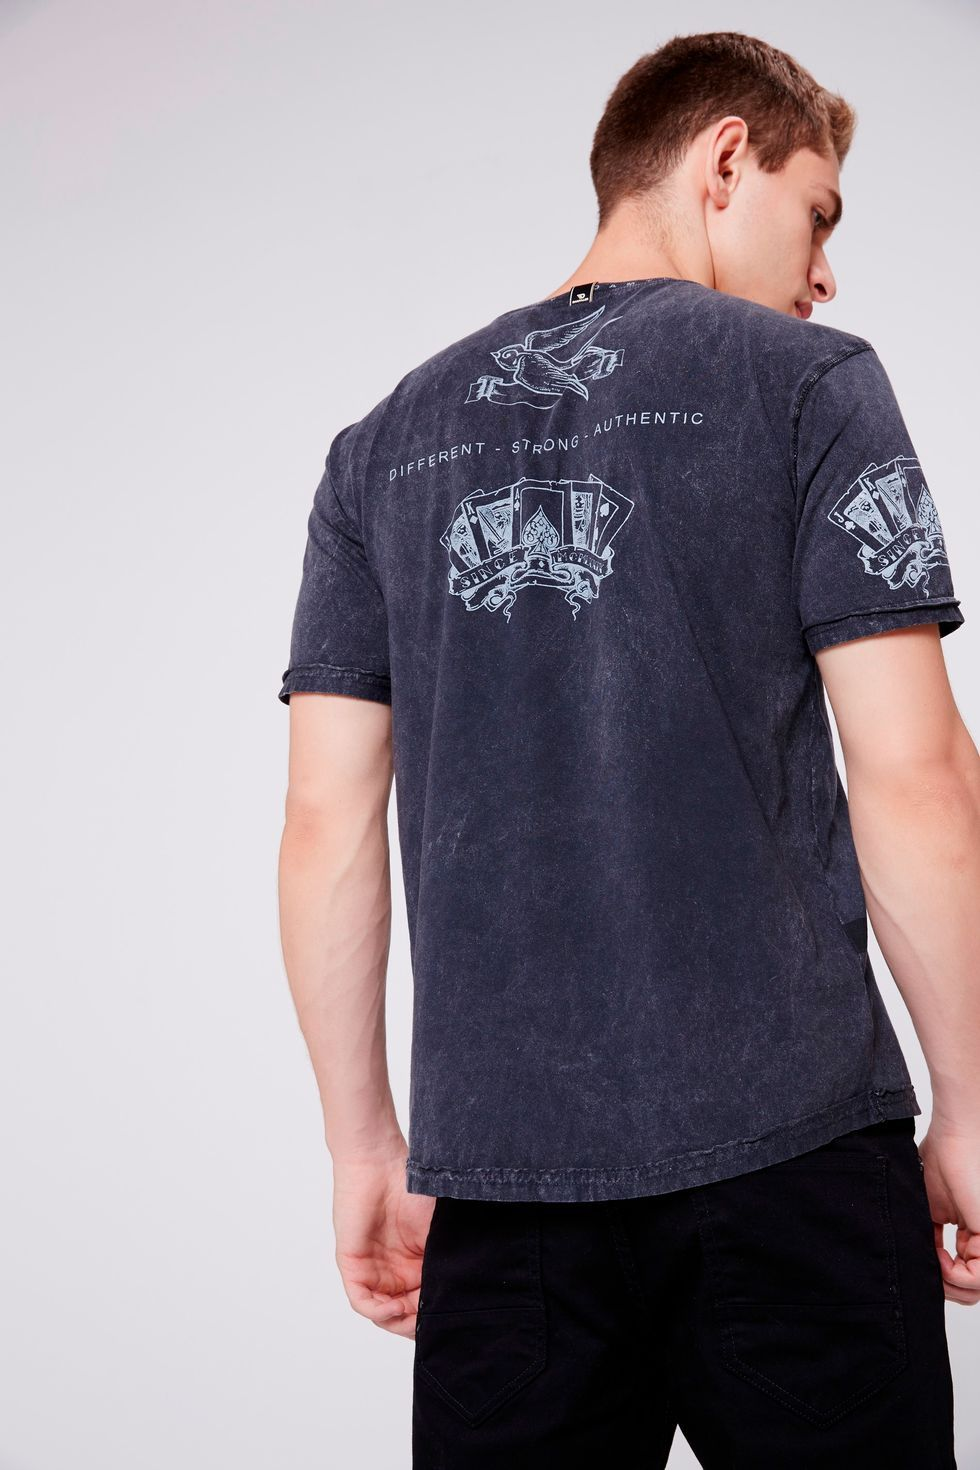 9253ac0d0 Camiseta Tingida Masculina - Damyller-smartphone